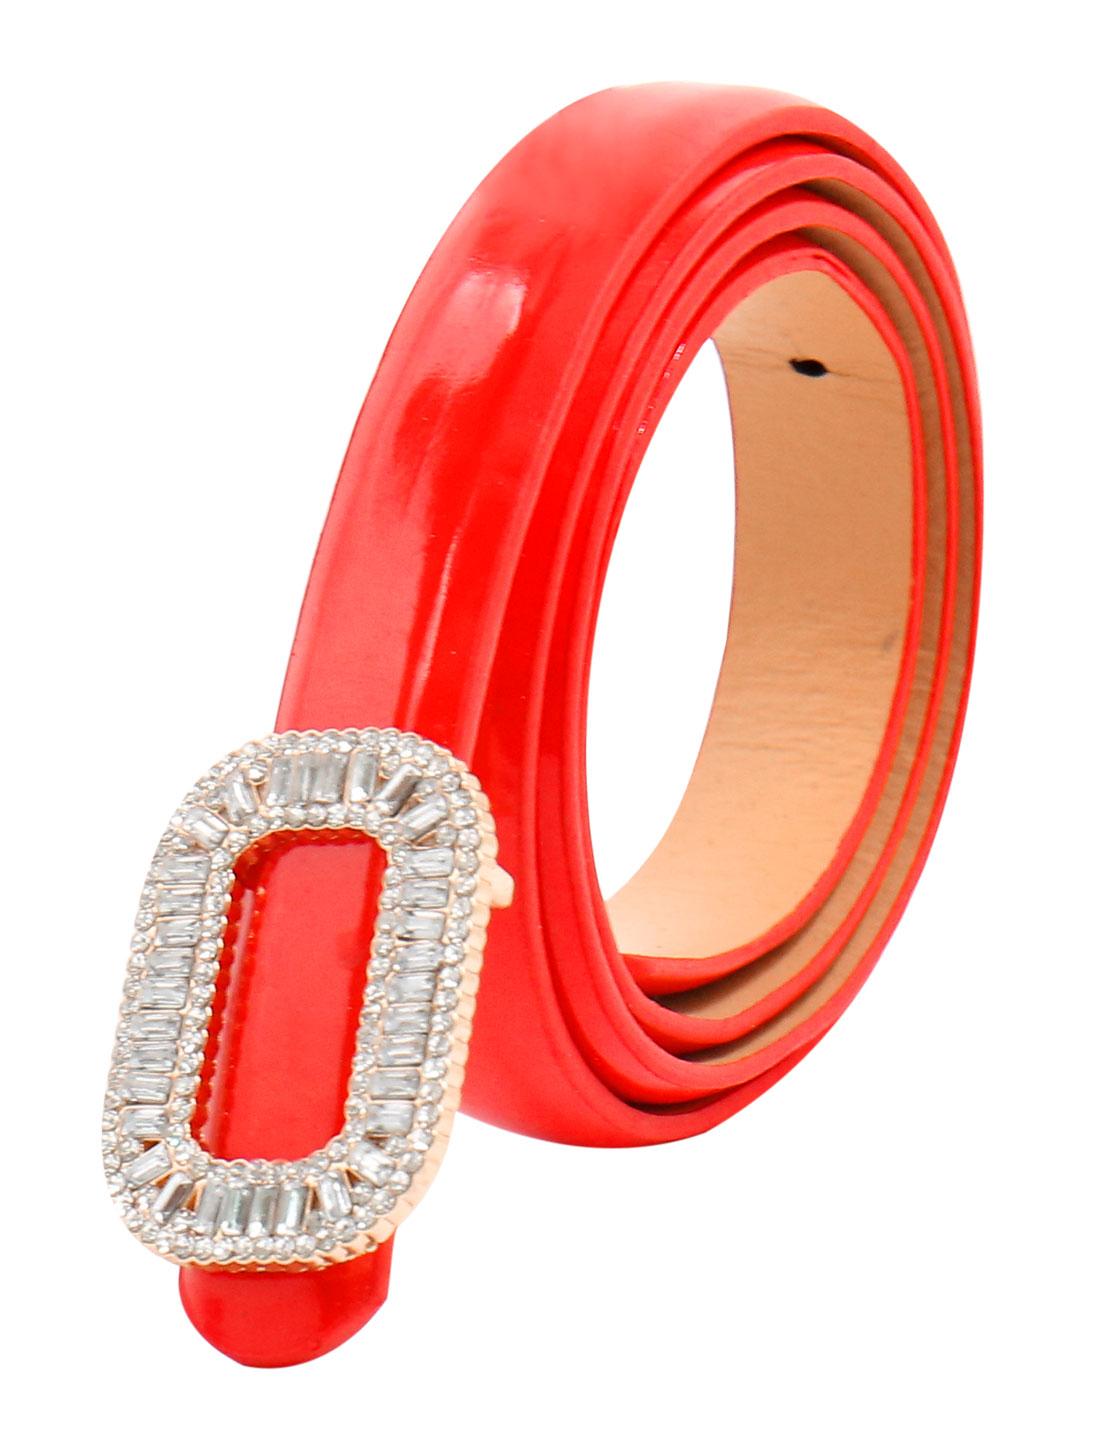 Women Rhinestone Decor Press Buckle Skinny Waist Belt Red